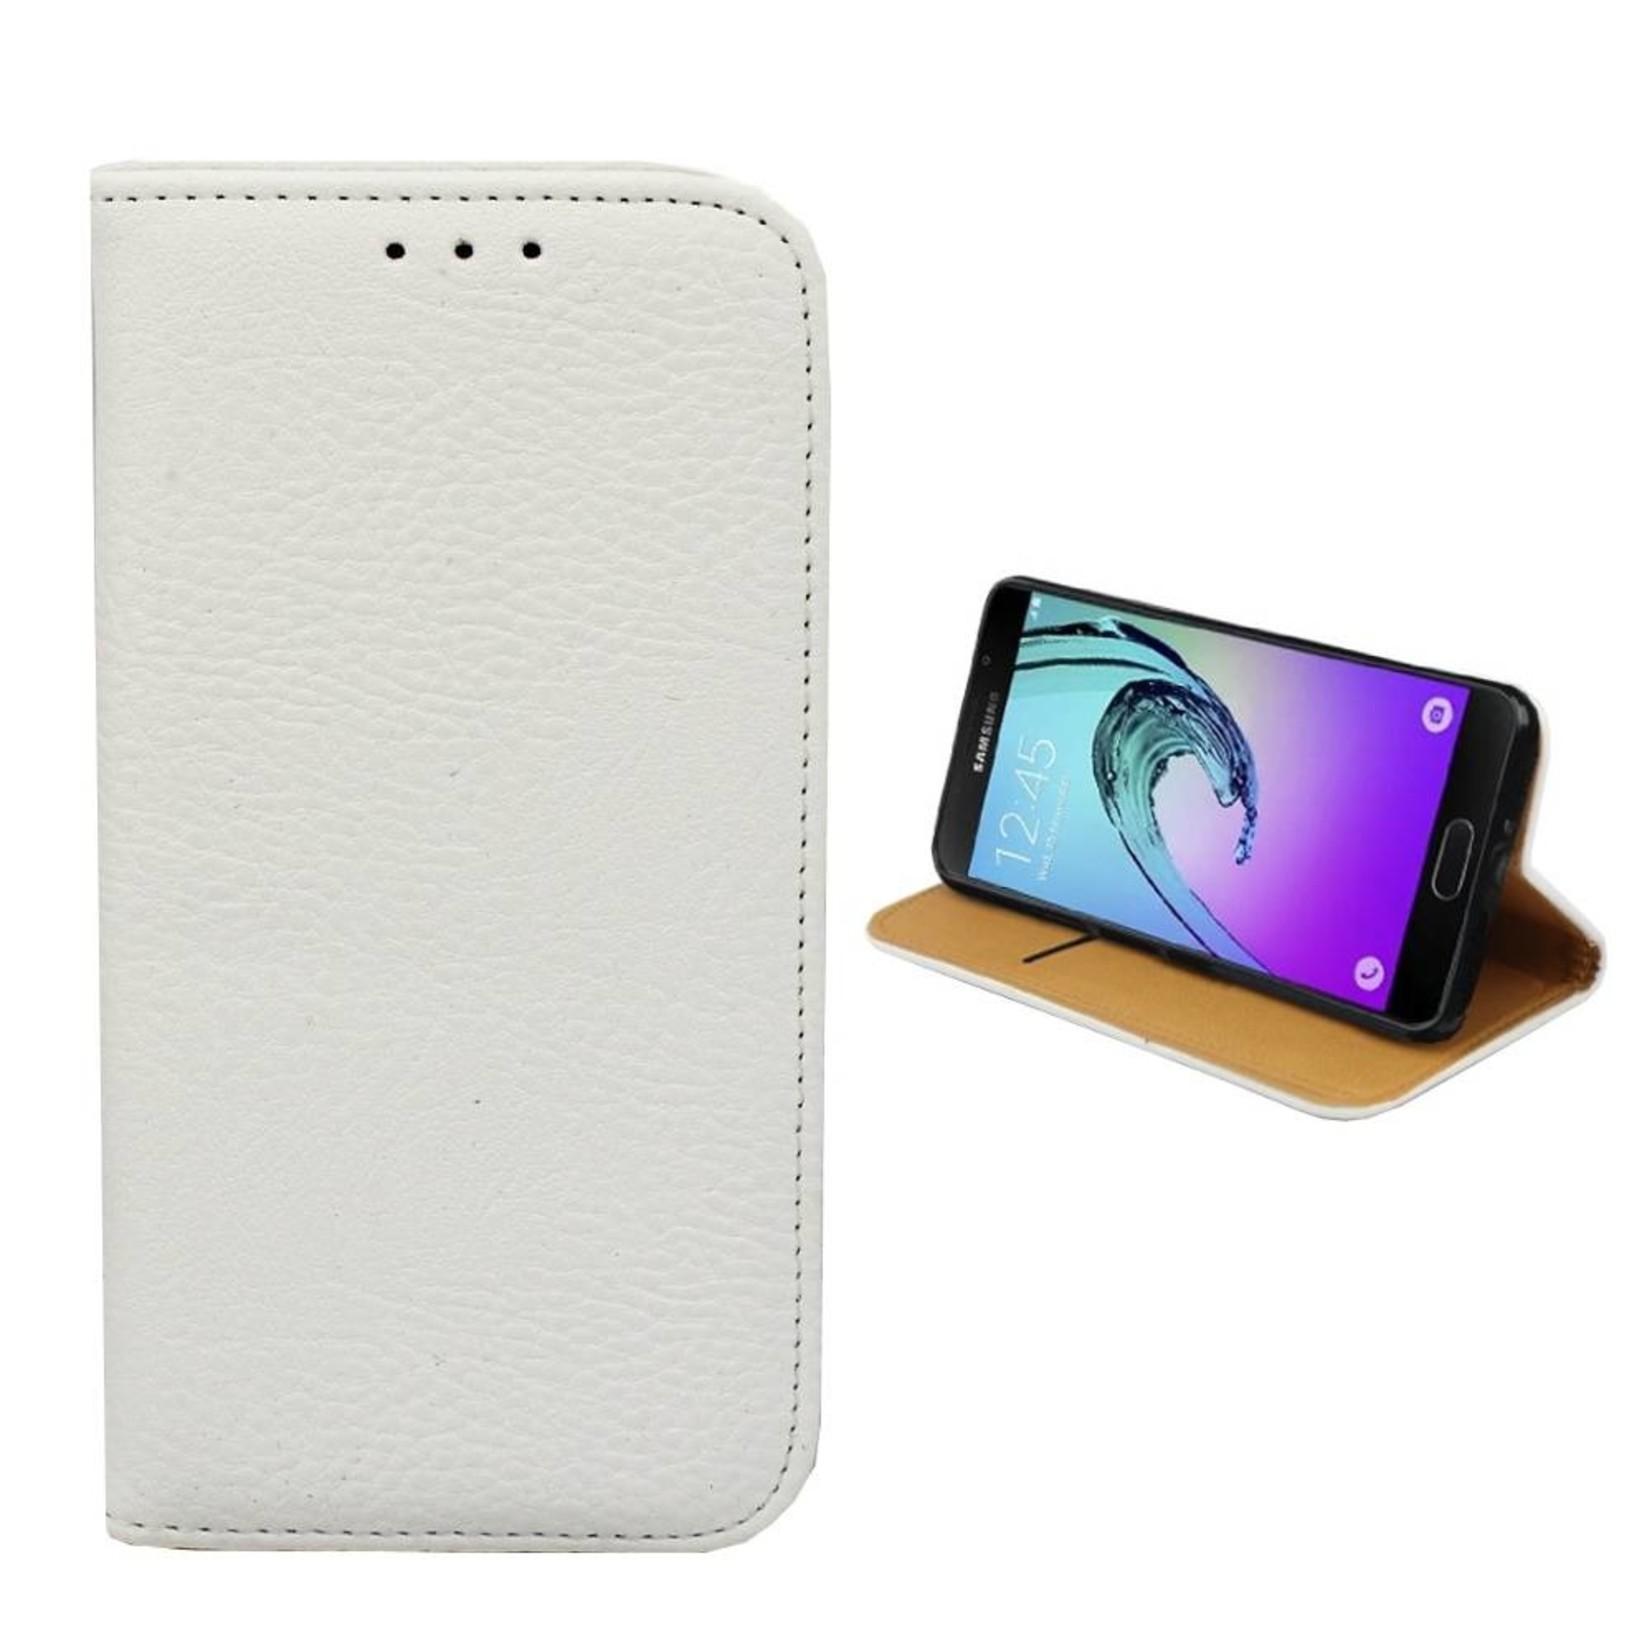 Colorfone Hoesje Book voor Samsung Galaxy J1 Mini/Prime Wit